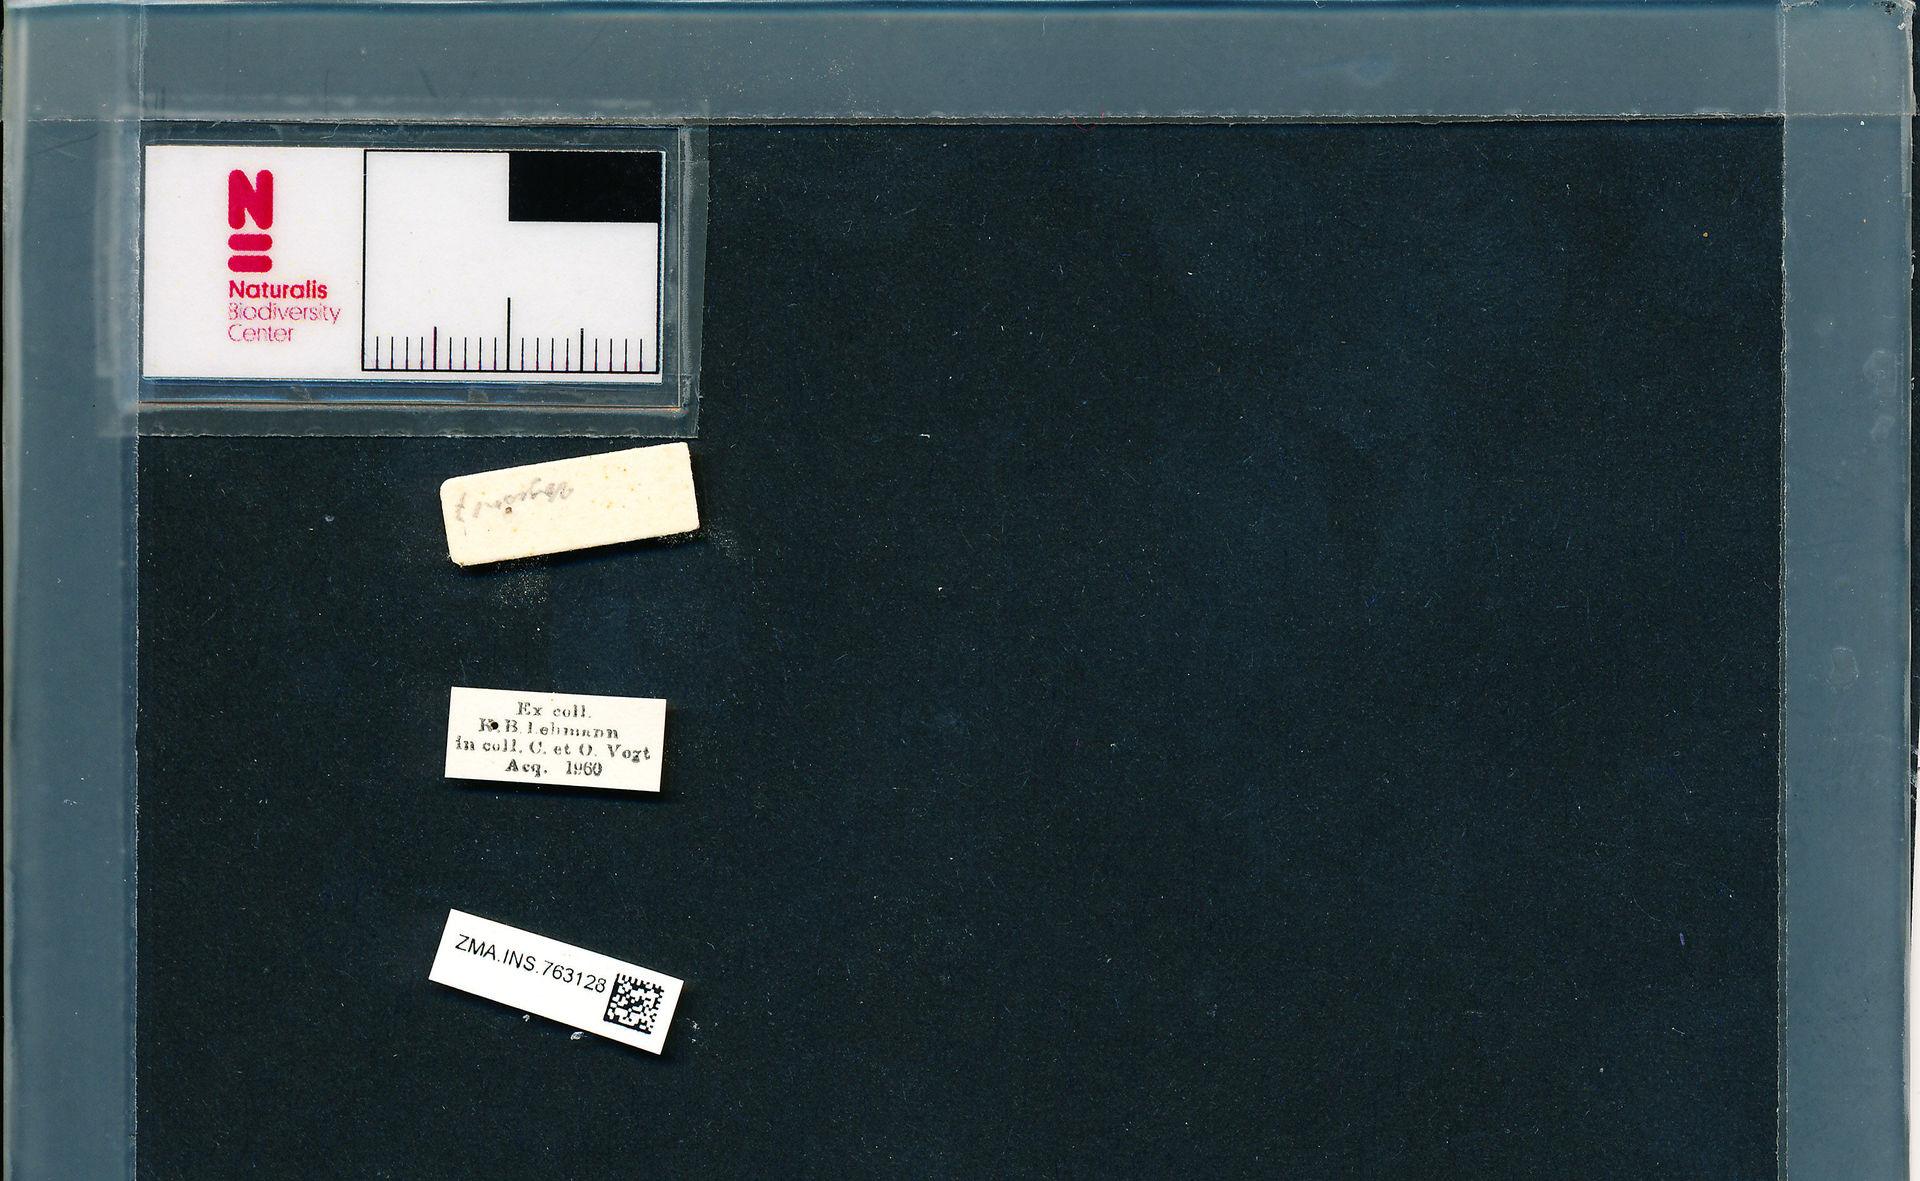 ZMA.INS.763128 | Bombus (Pyrobombus) pratorum pratorum (Linnaeus, 1761)